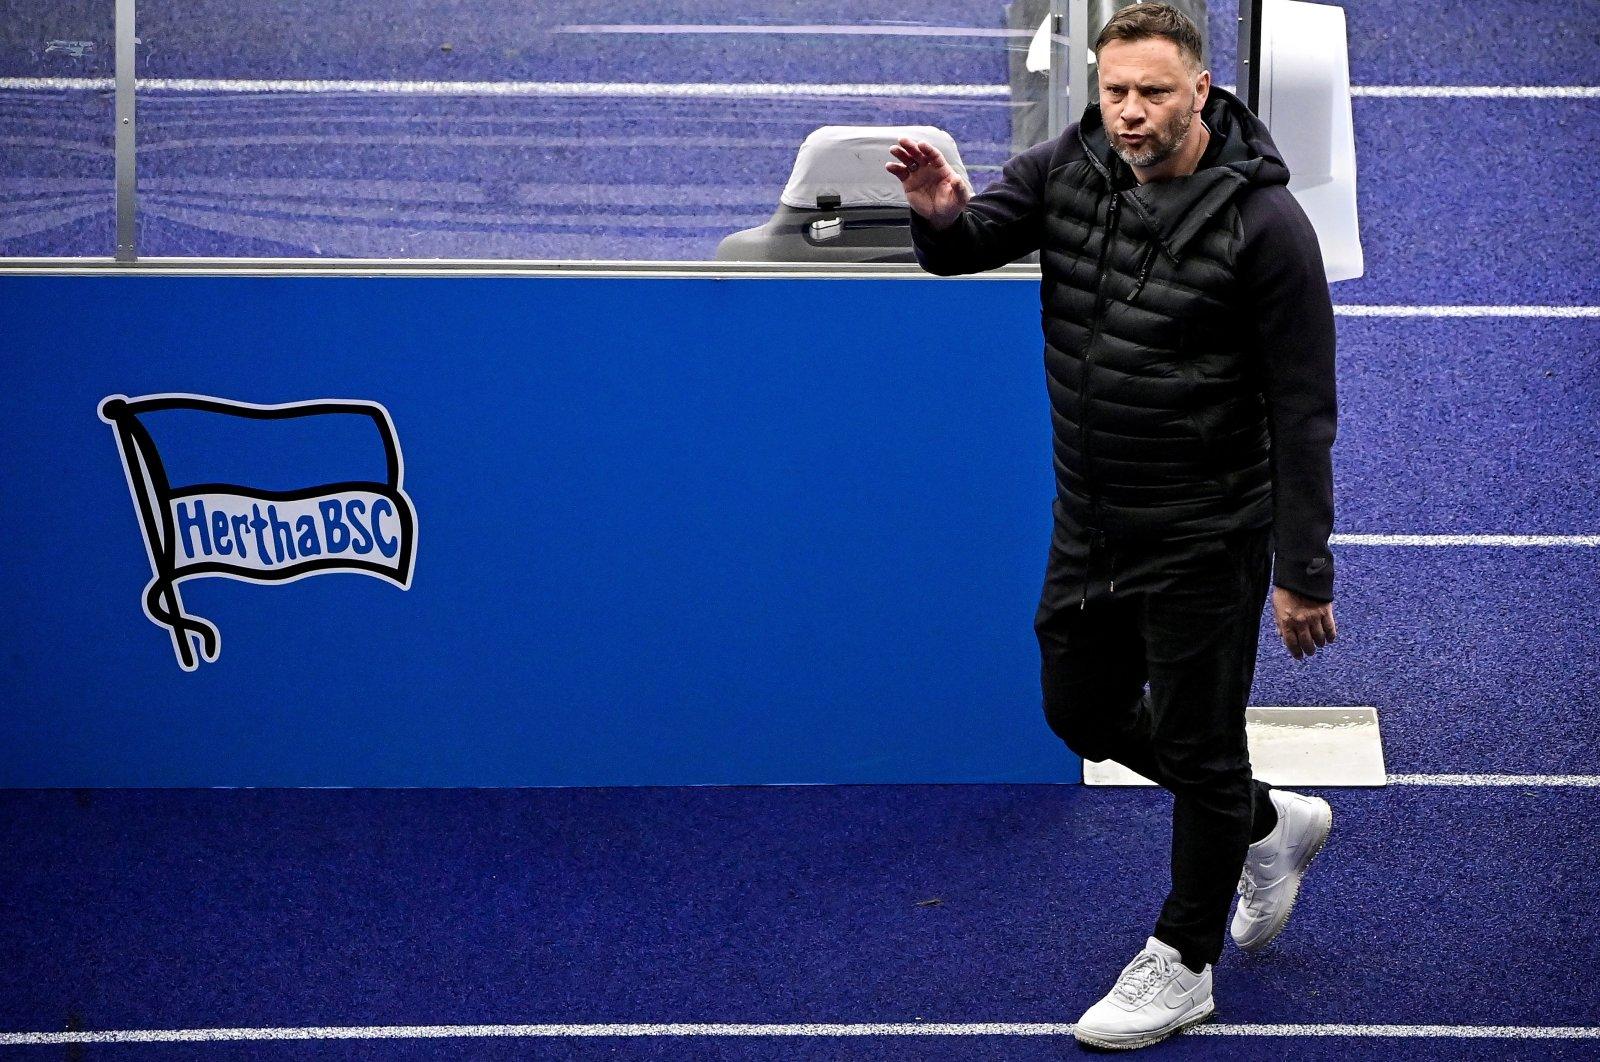 Hertha's head coach Pal Dardai reacts after a Bundesliga match against Borussia Moenchengladbach, Berlin, Germany, April 10, 2021. (EPA Photo)